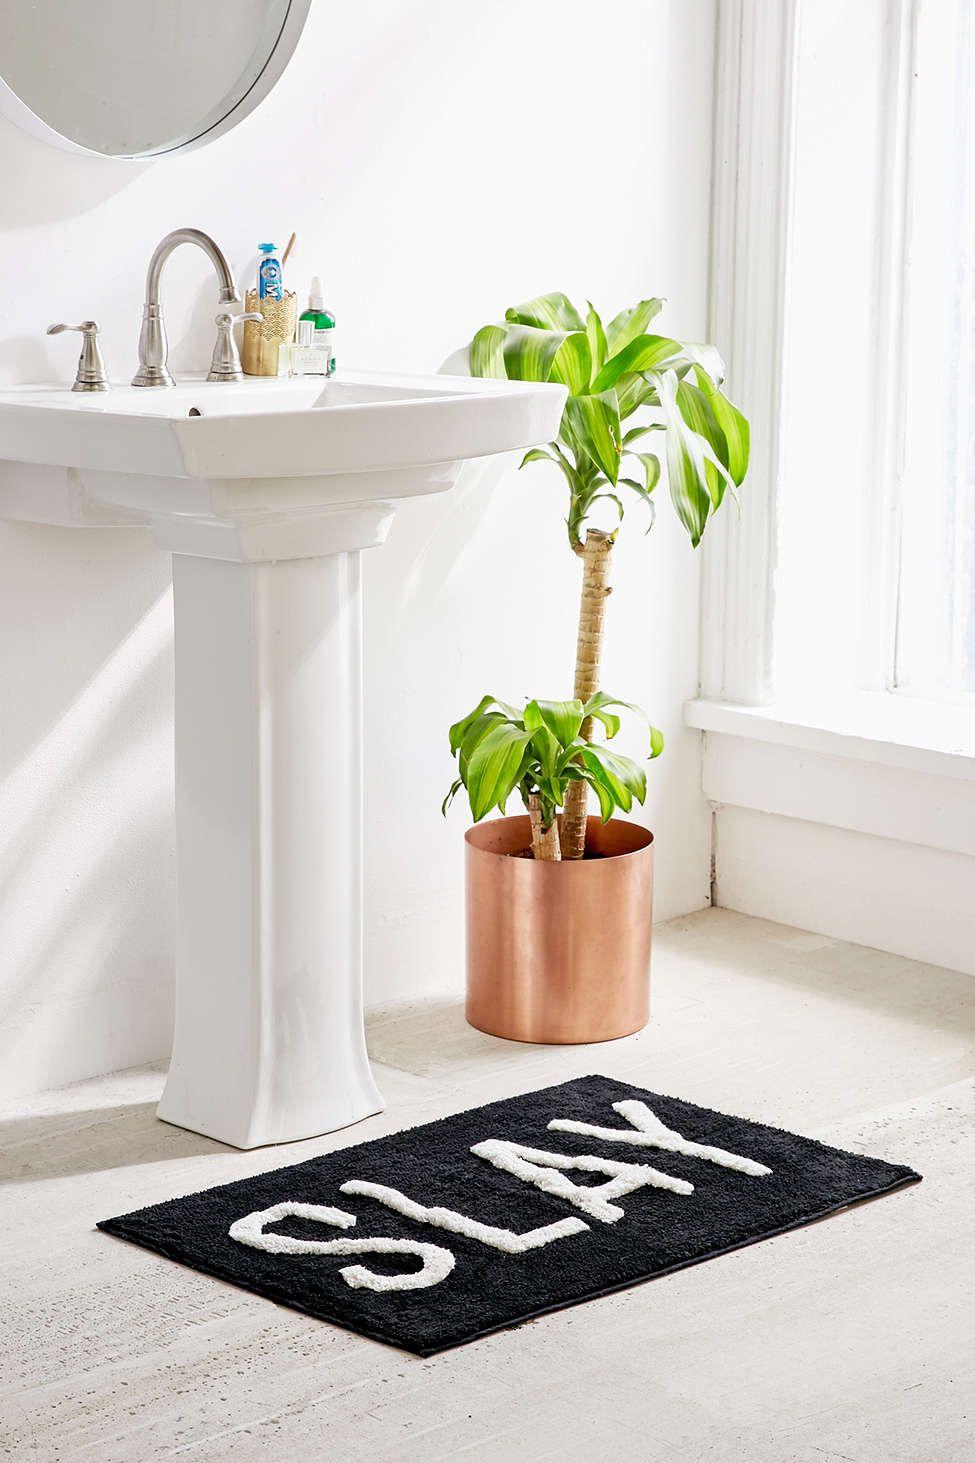 Slay Bath Mat Looks Banheiro Look